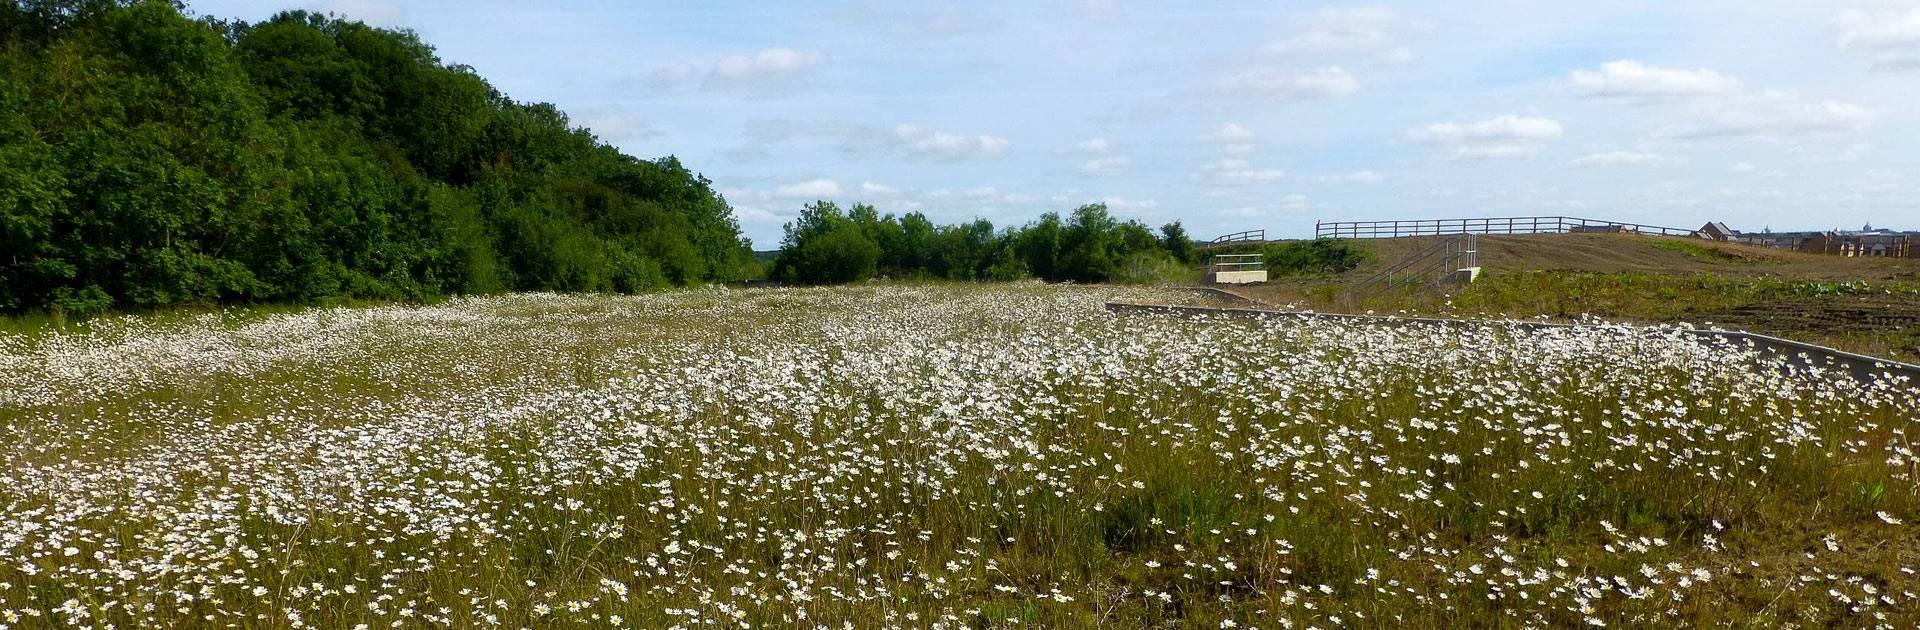 Net Gain and Biodiversity Offsetting